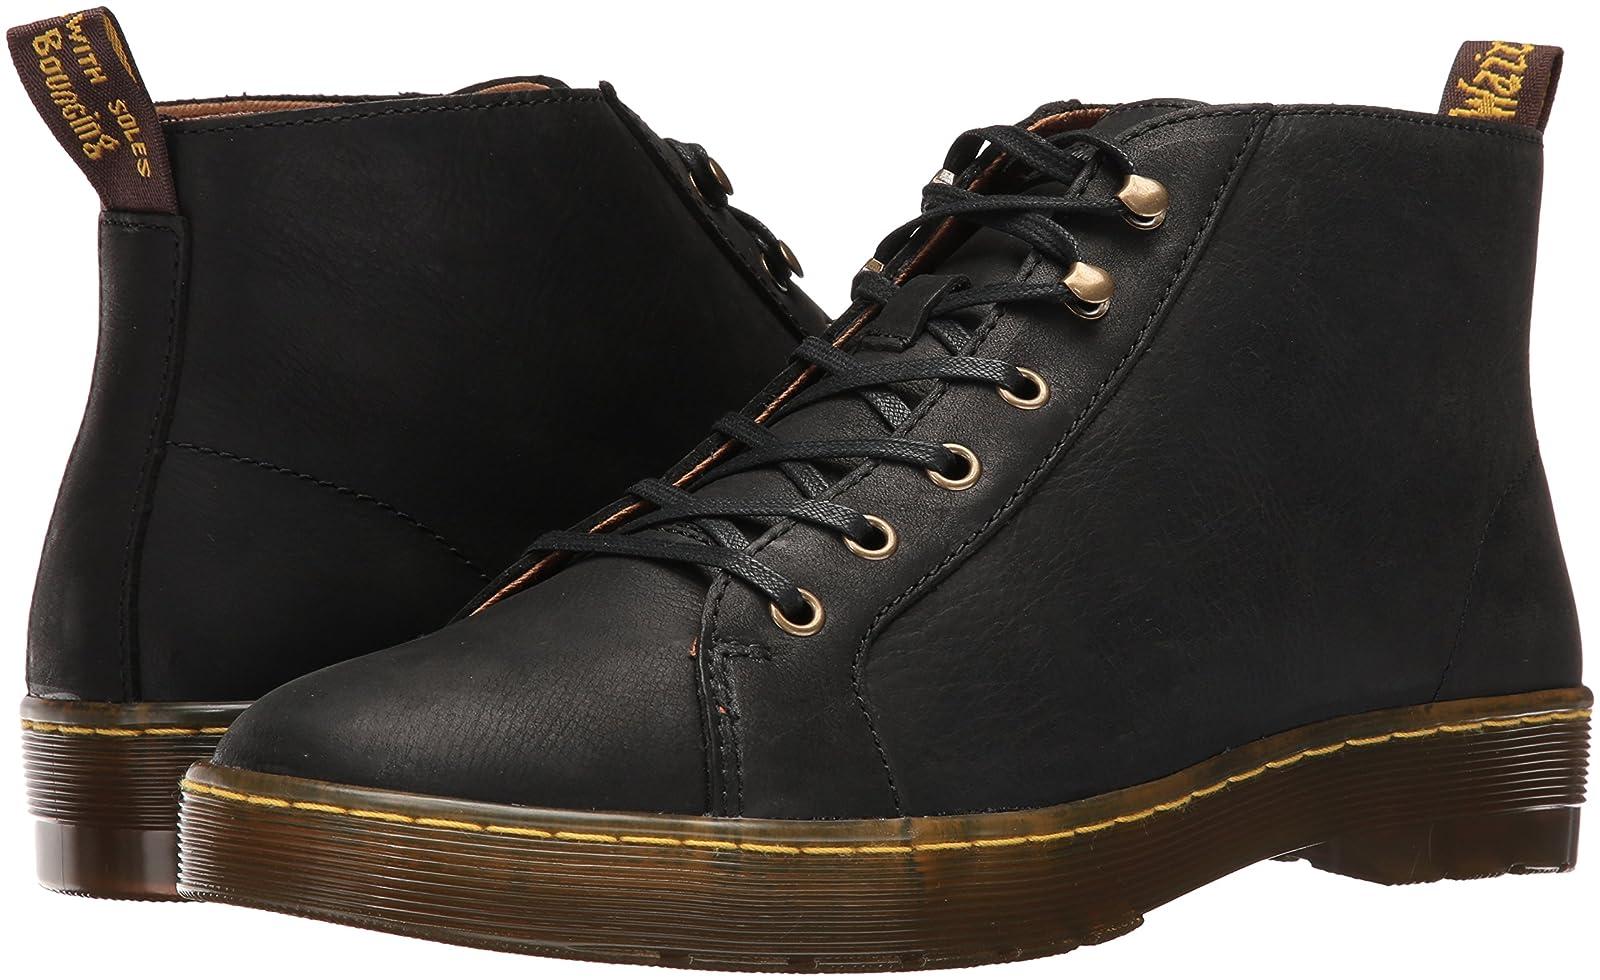 Dr. Martens Men's Coburg Wyoming Chukka Boot 9 M US - 6